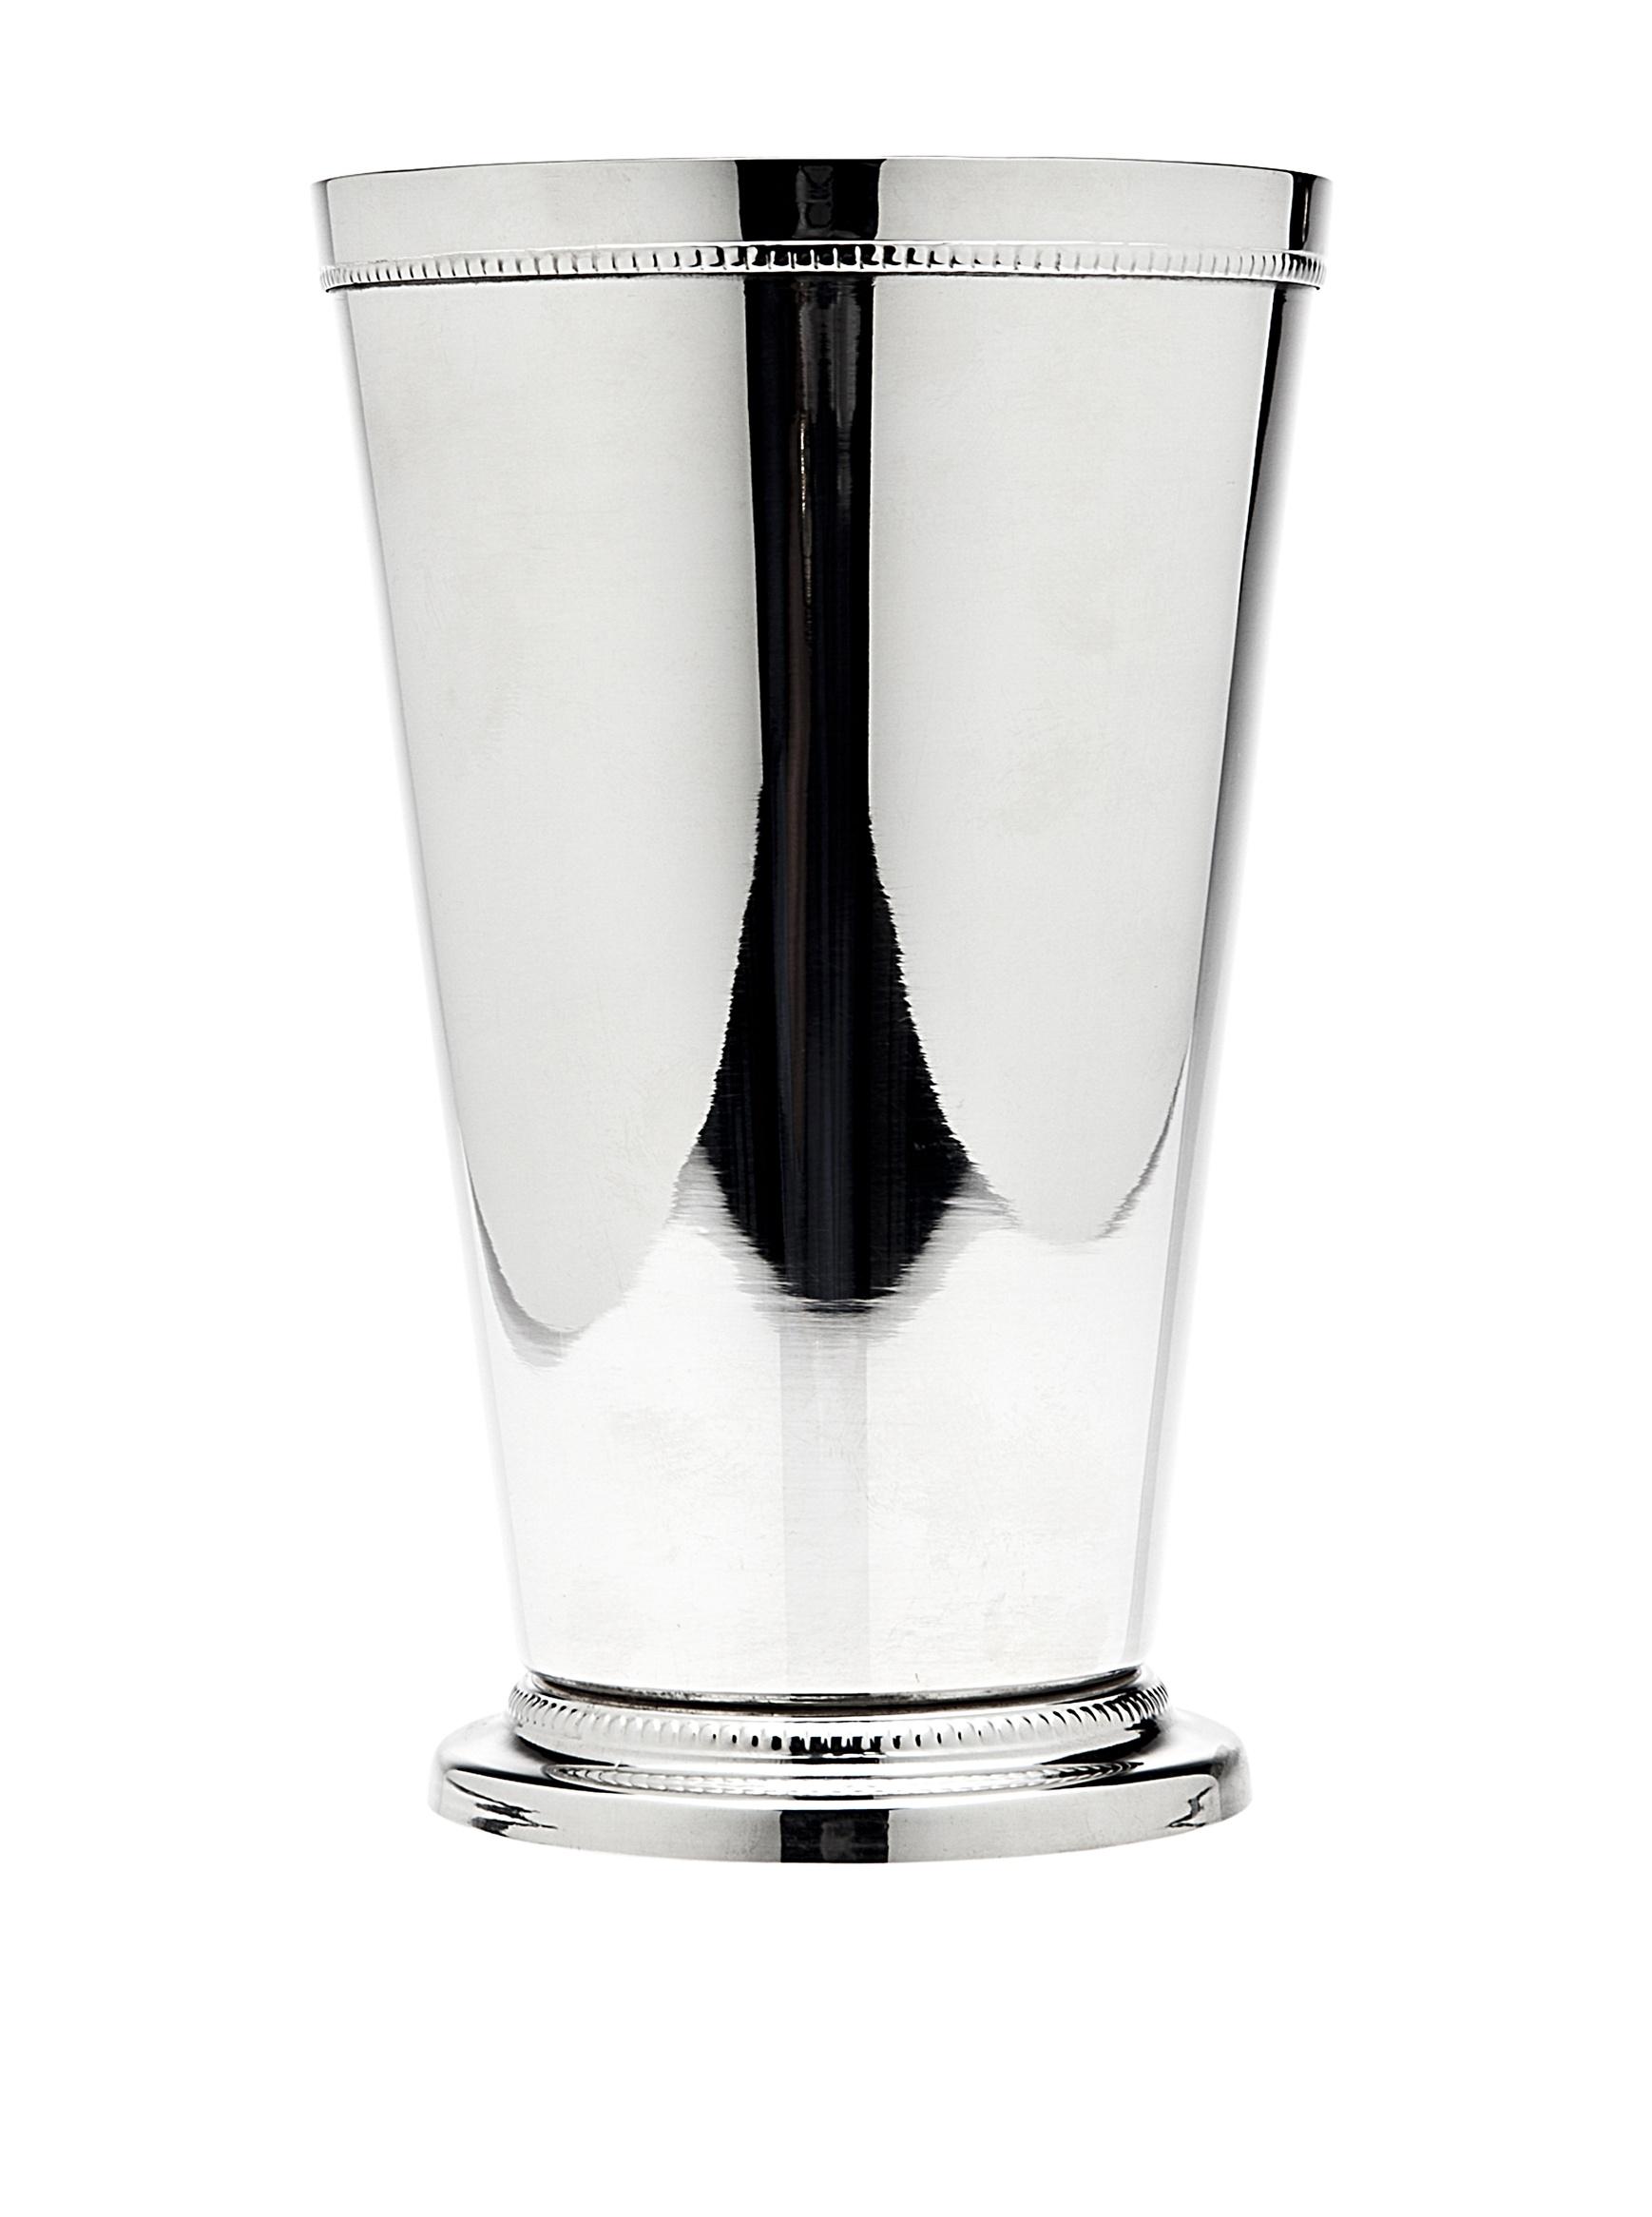 Godinger 55201 Beaded Barware Beaded 4''x 6.25'' Mint Julep Cup,